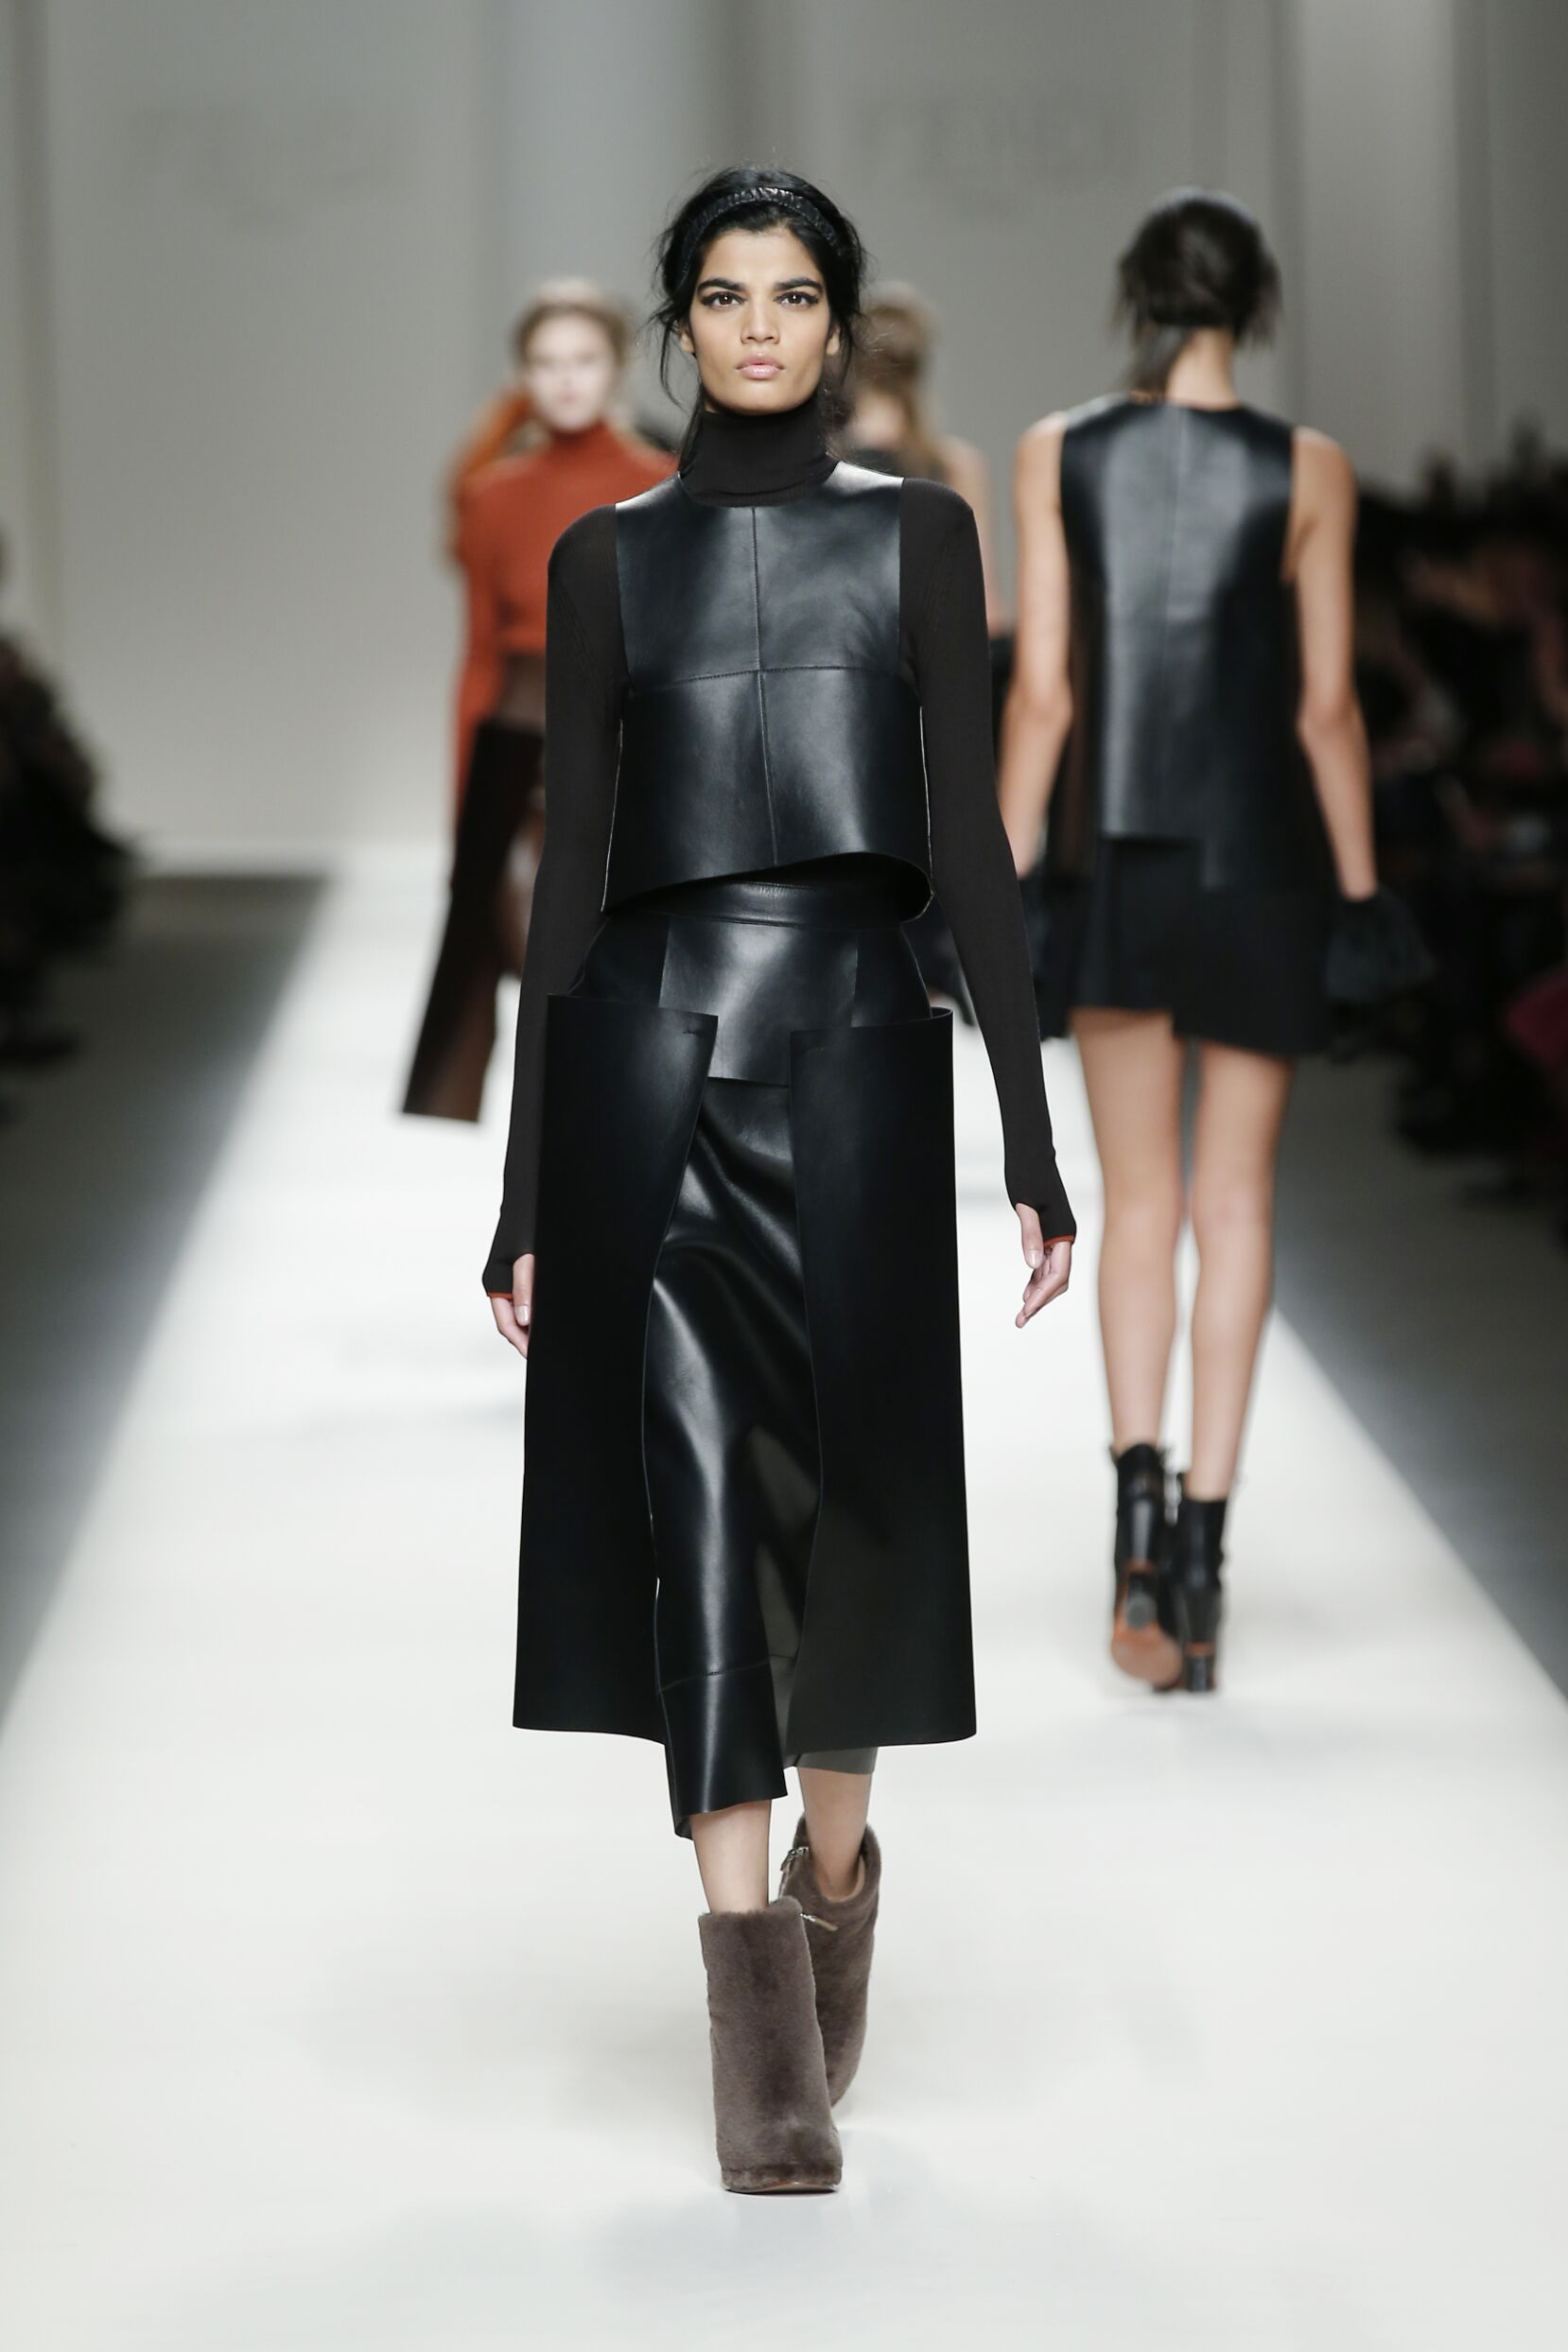 2015 Fashion Woman Model Fendi Collection Catwalk